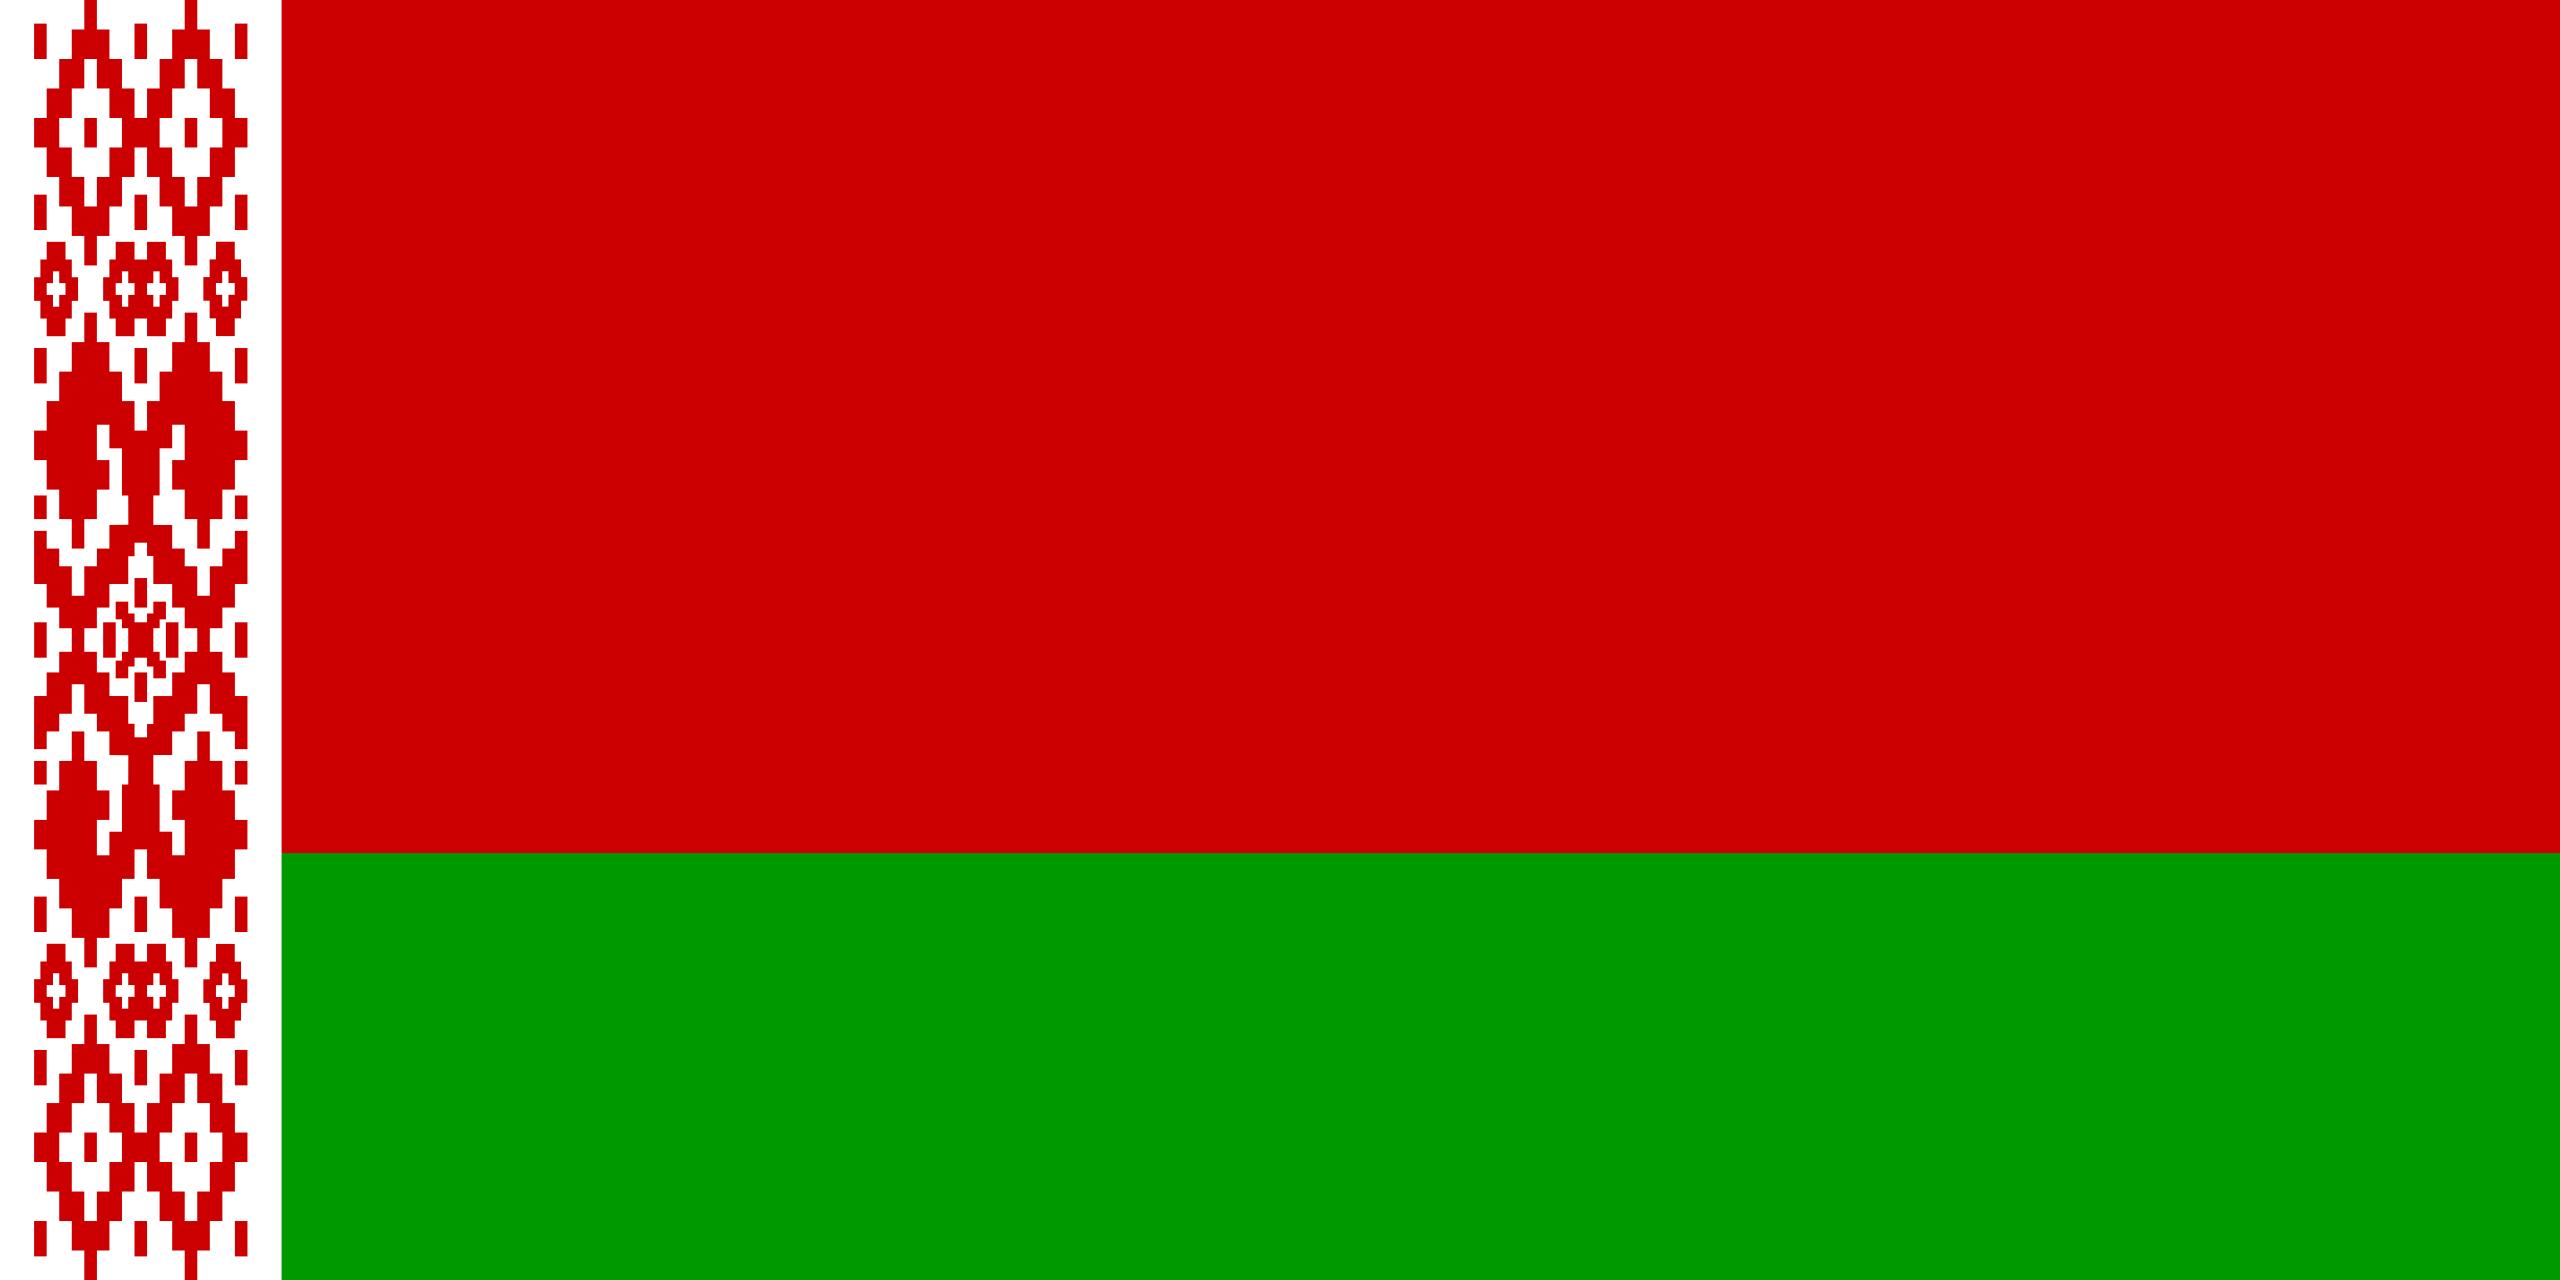 bielorrusia, страна, Эмблема, логотип, символ - Обои HD - Профессор falken.com